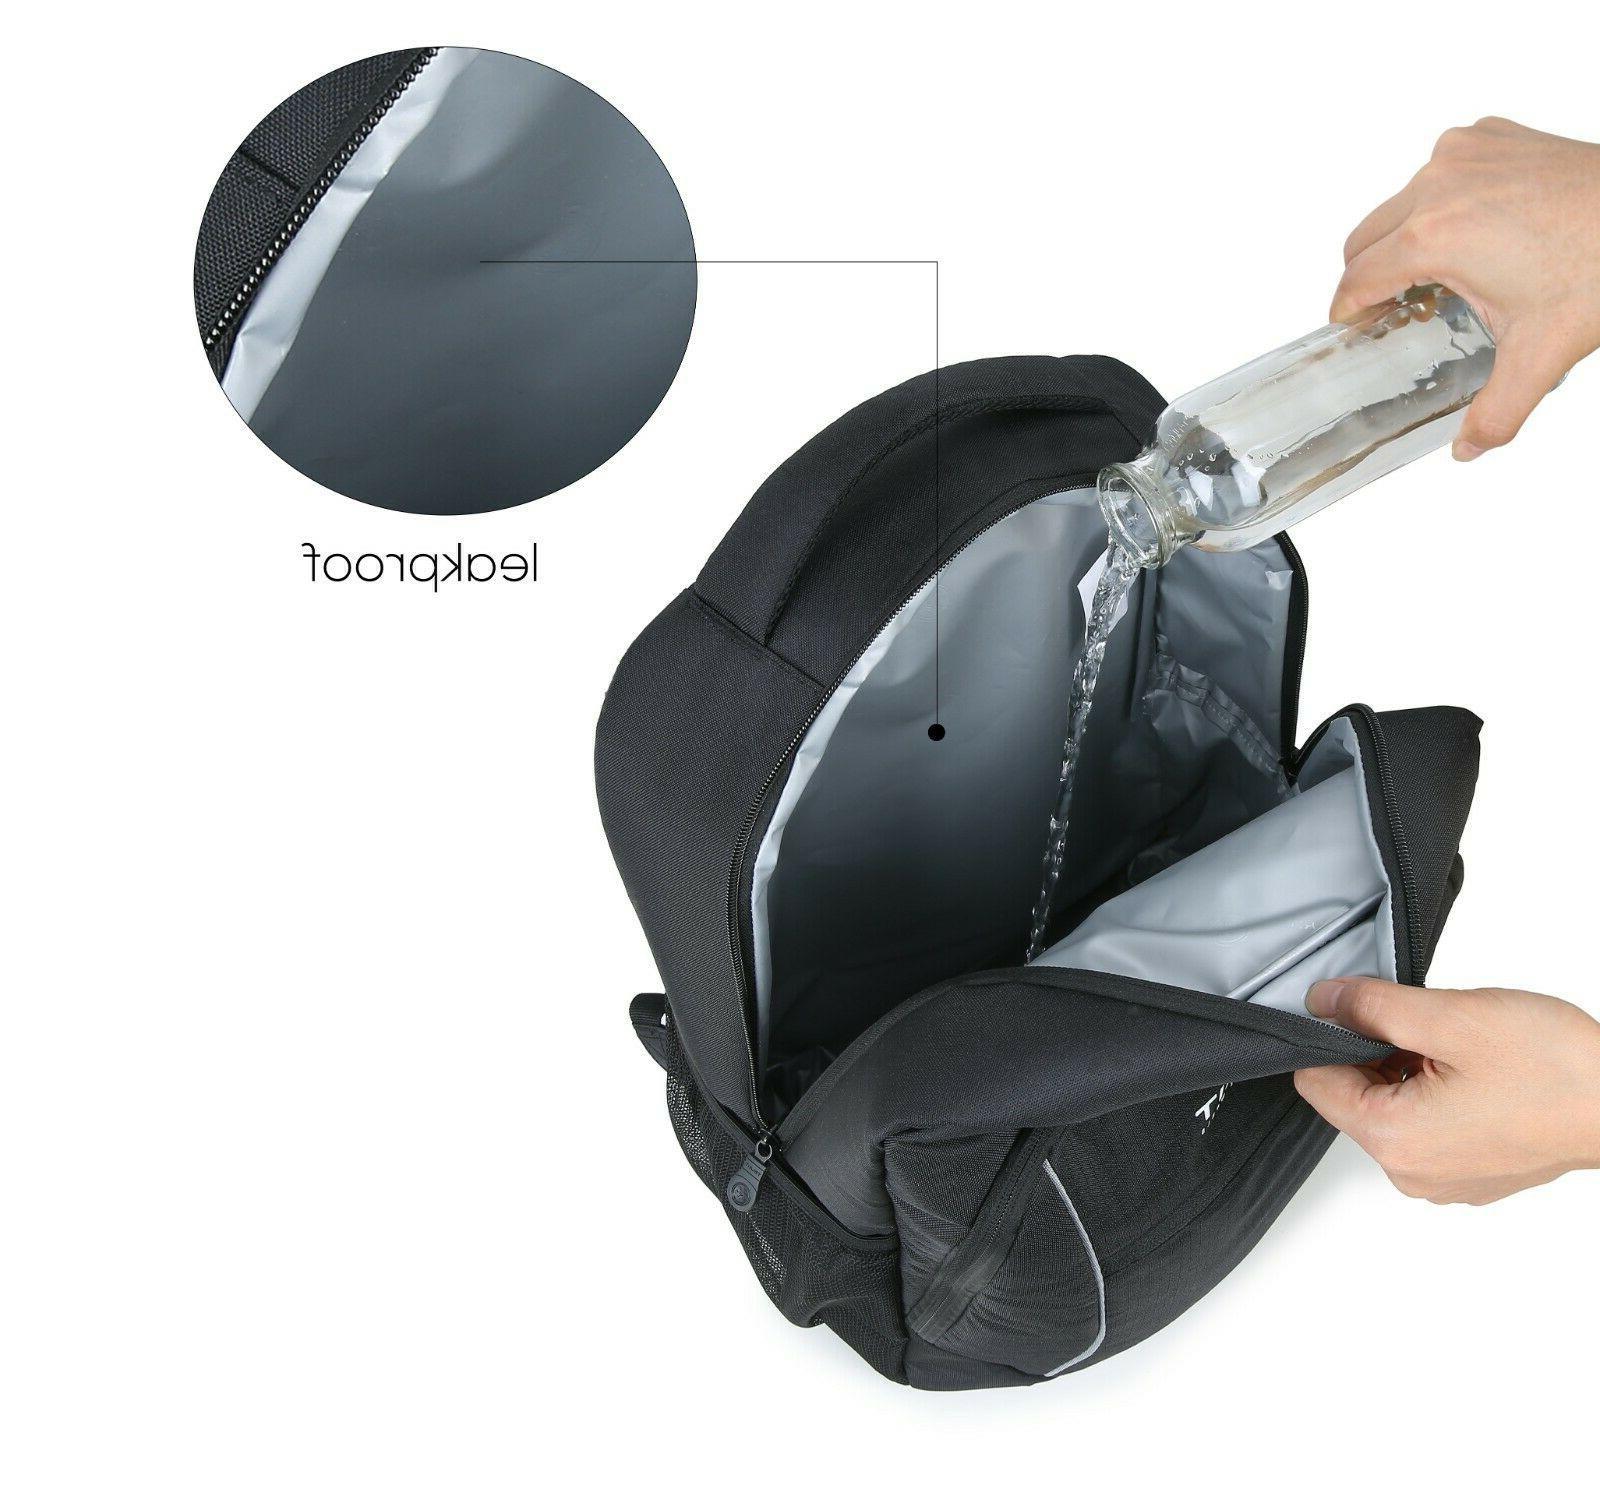 TOURIT Insulated Cooler Lightweight Leak-Proof